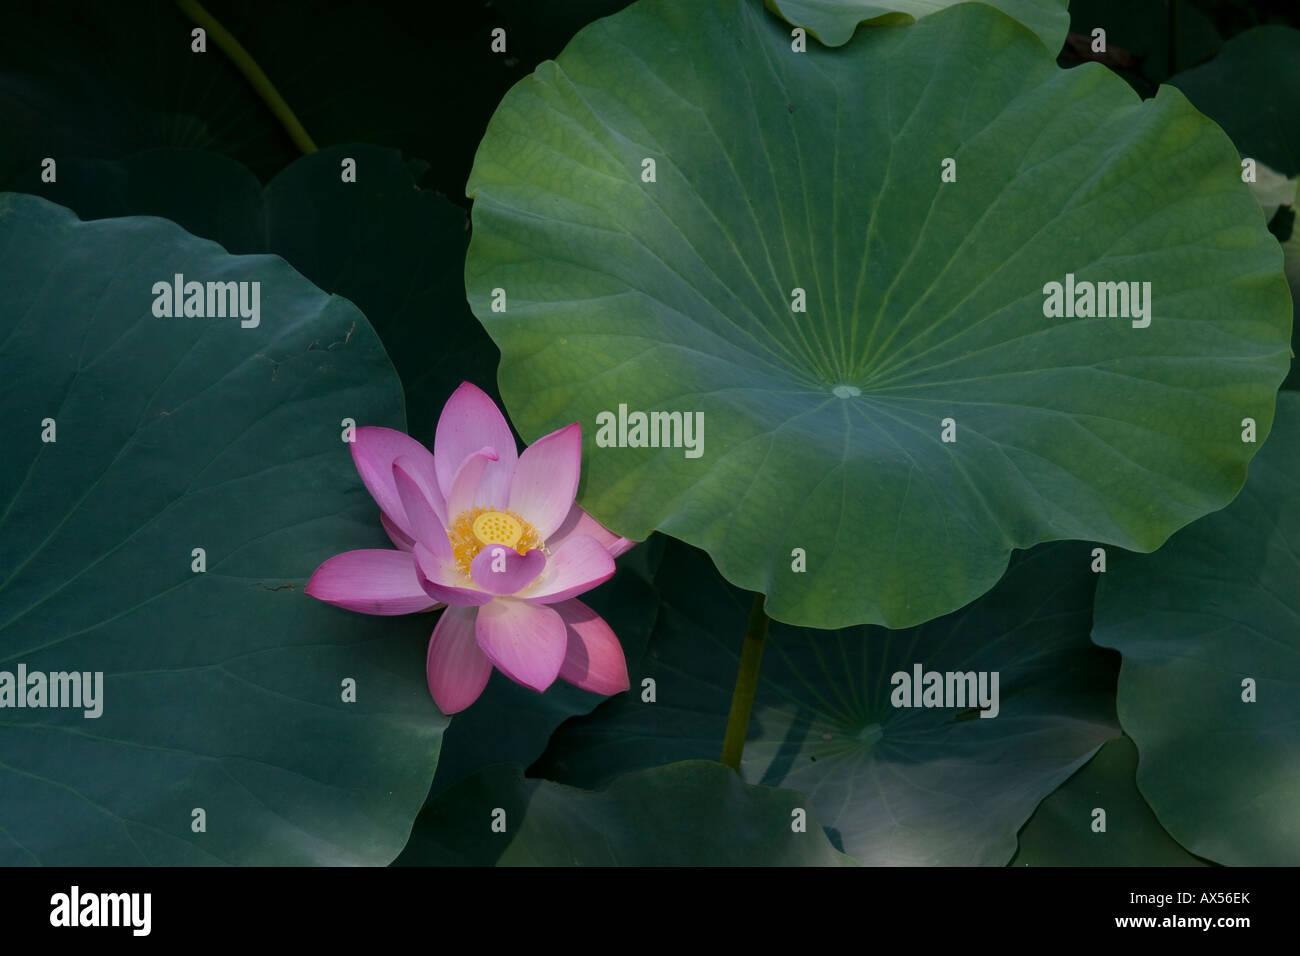 Chinese lotus flower stock photo royalty free image 16732746 alamy chinese lotus flower izmirmasajfo